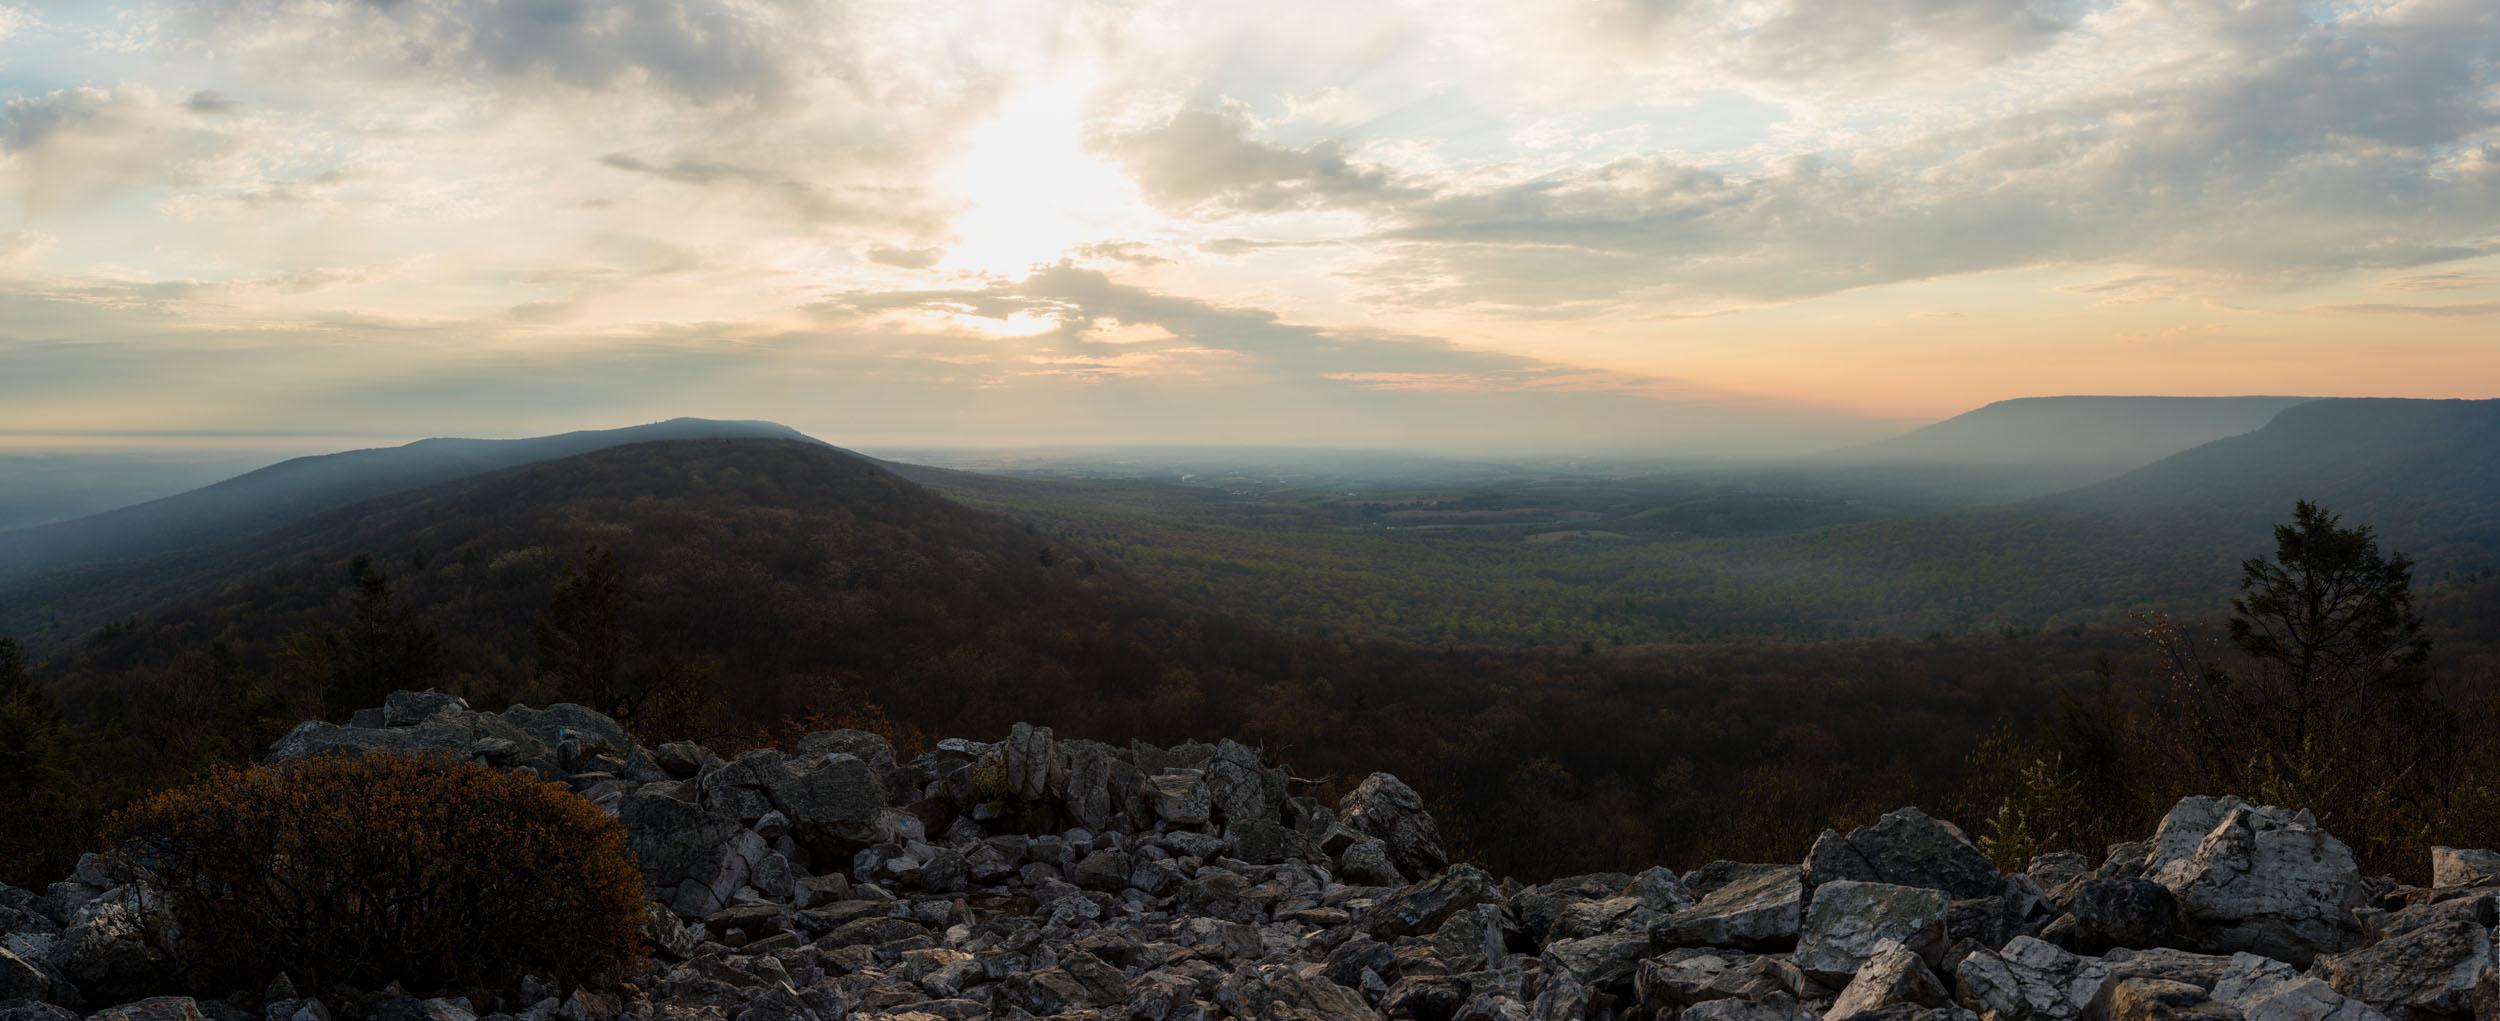 Hawks Mountain, PA